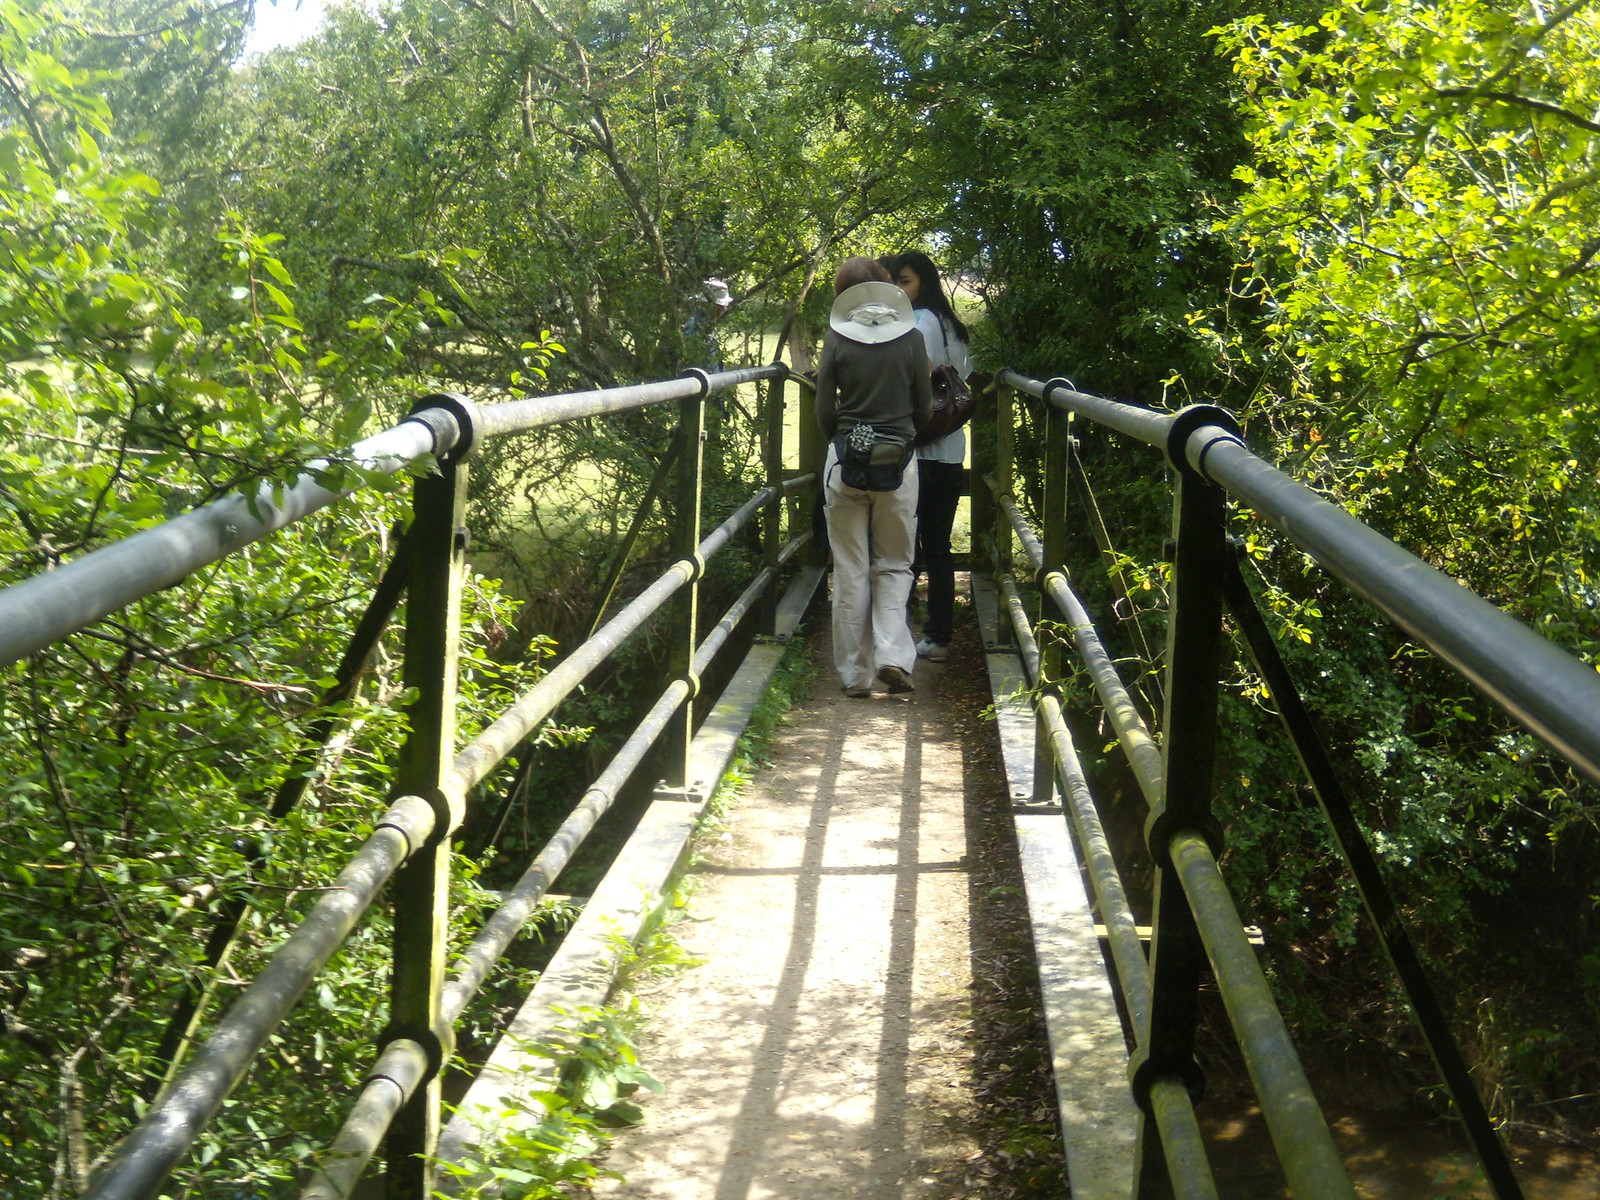 Over a bridge Cowden to Hever